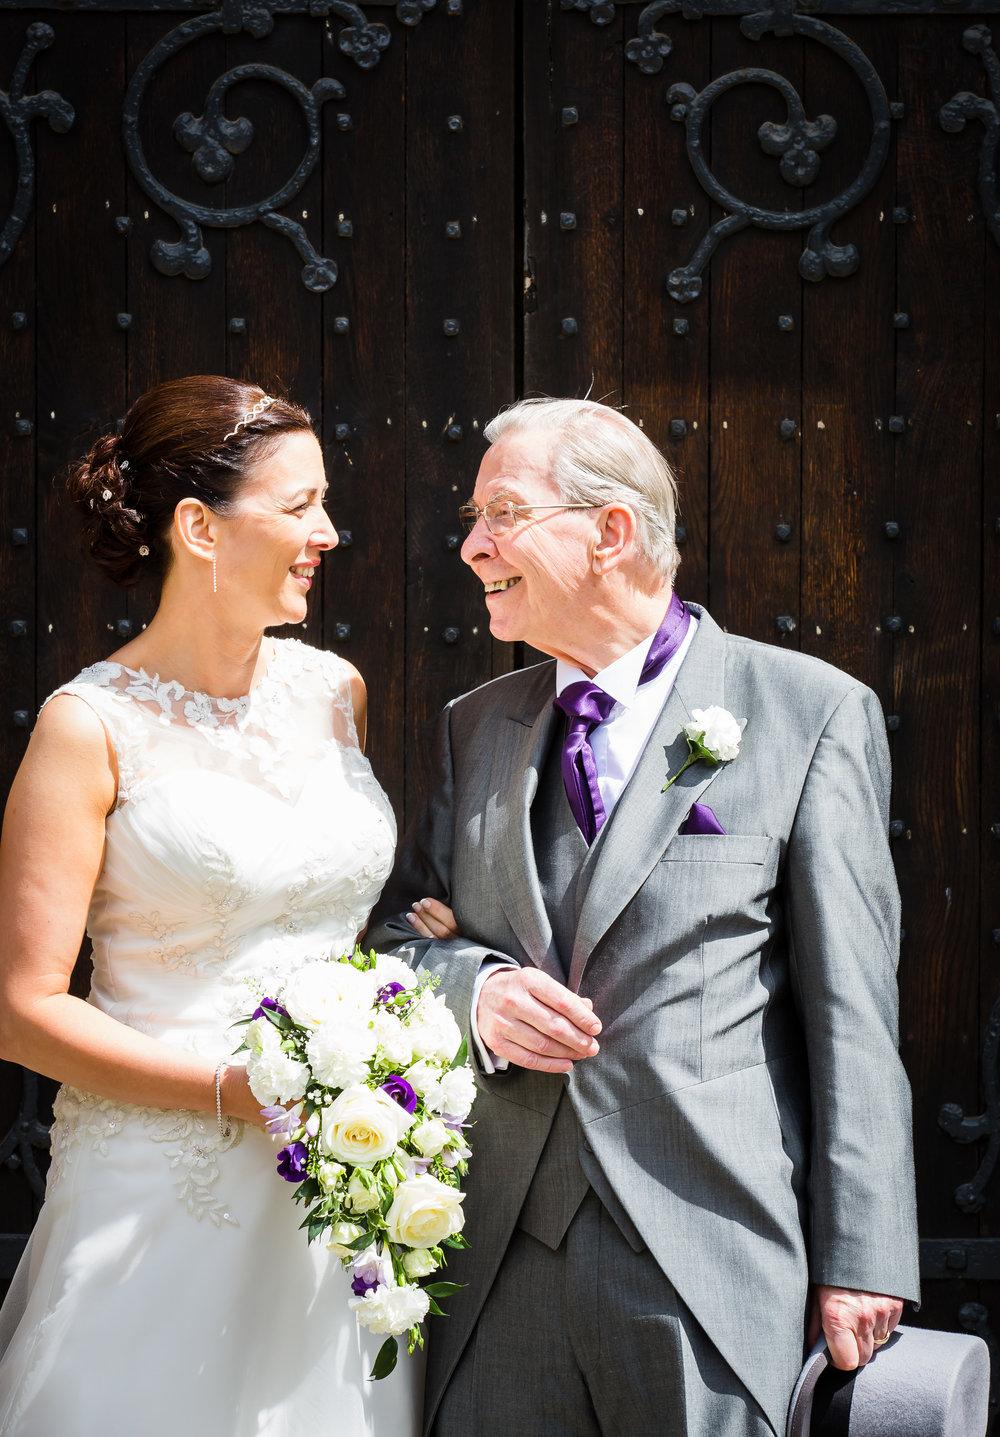 Anne & Richard's Wedding_Helen Cotton Photography©68.JPG